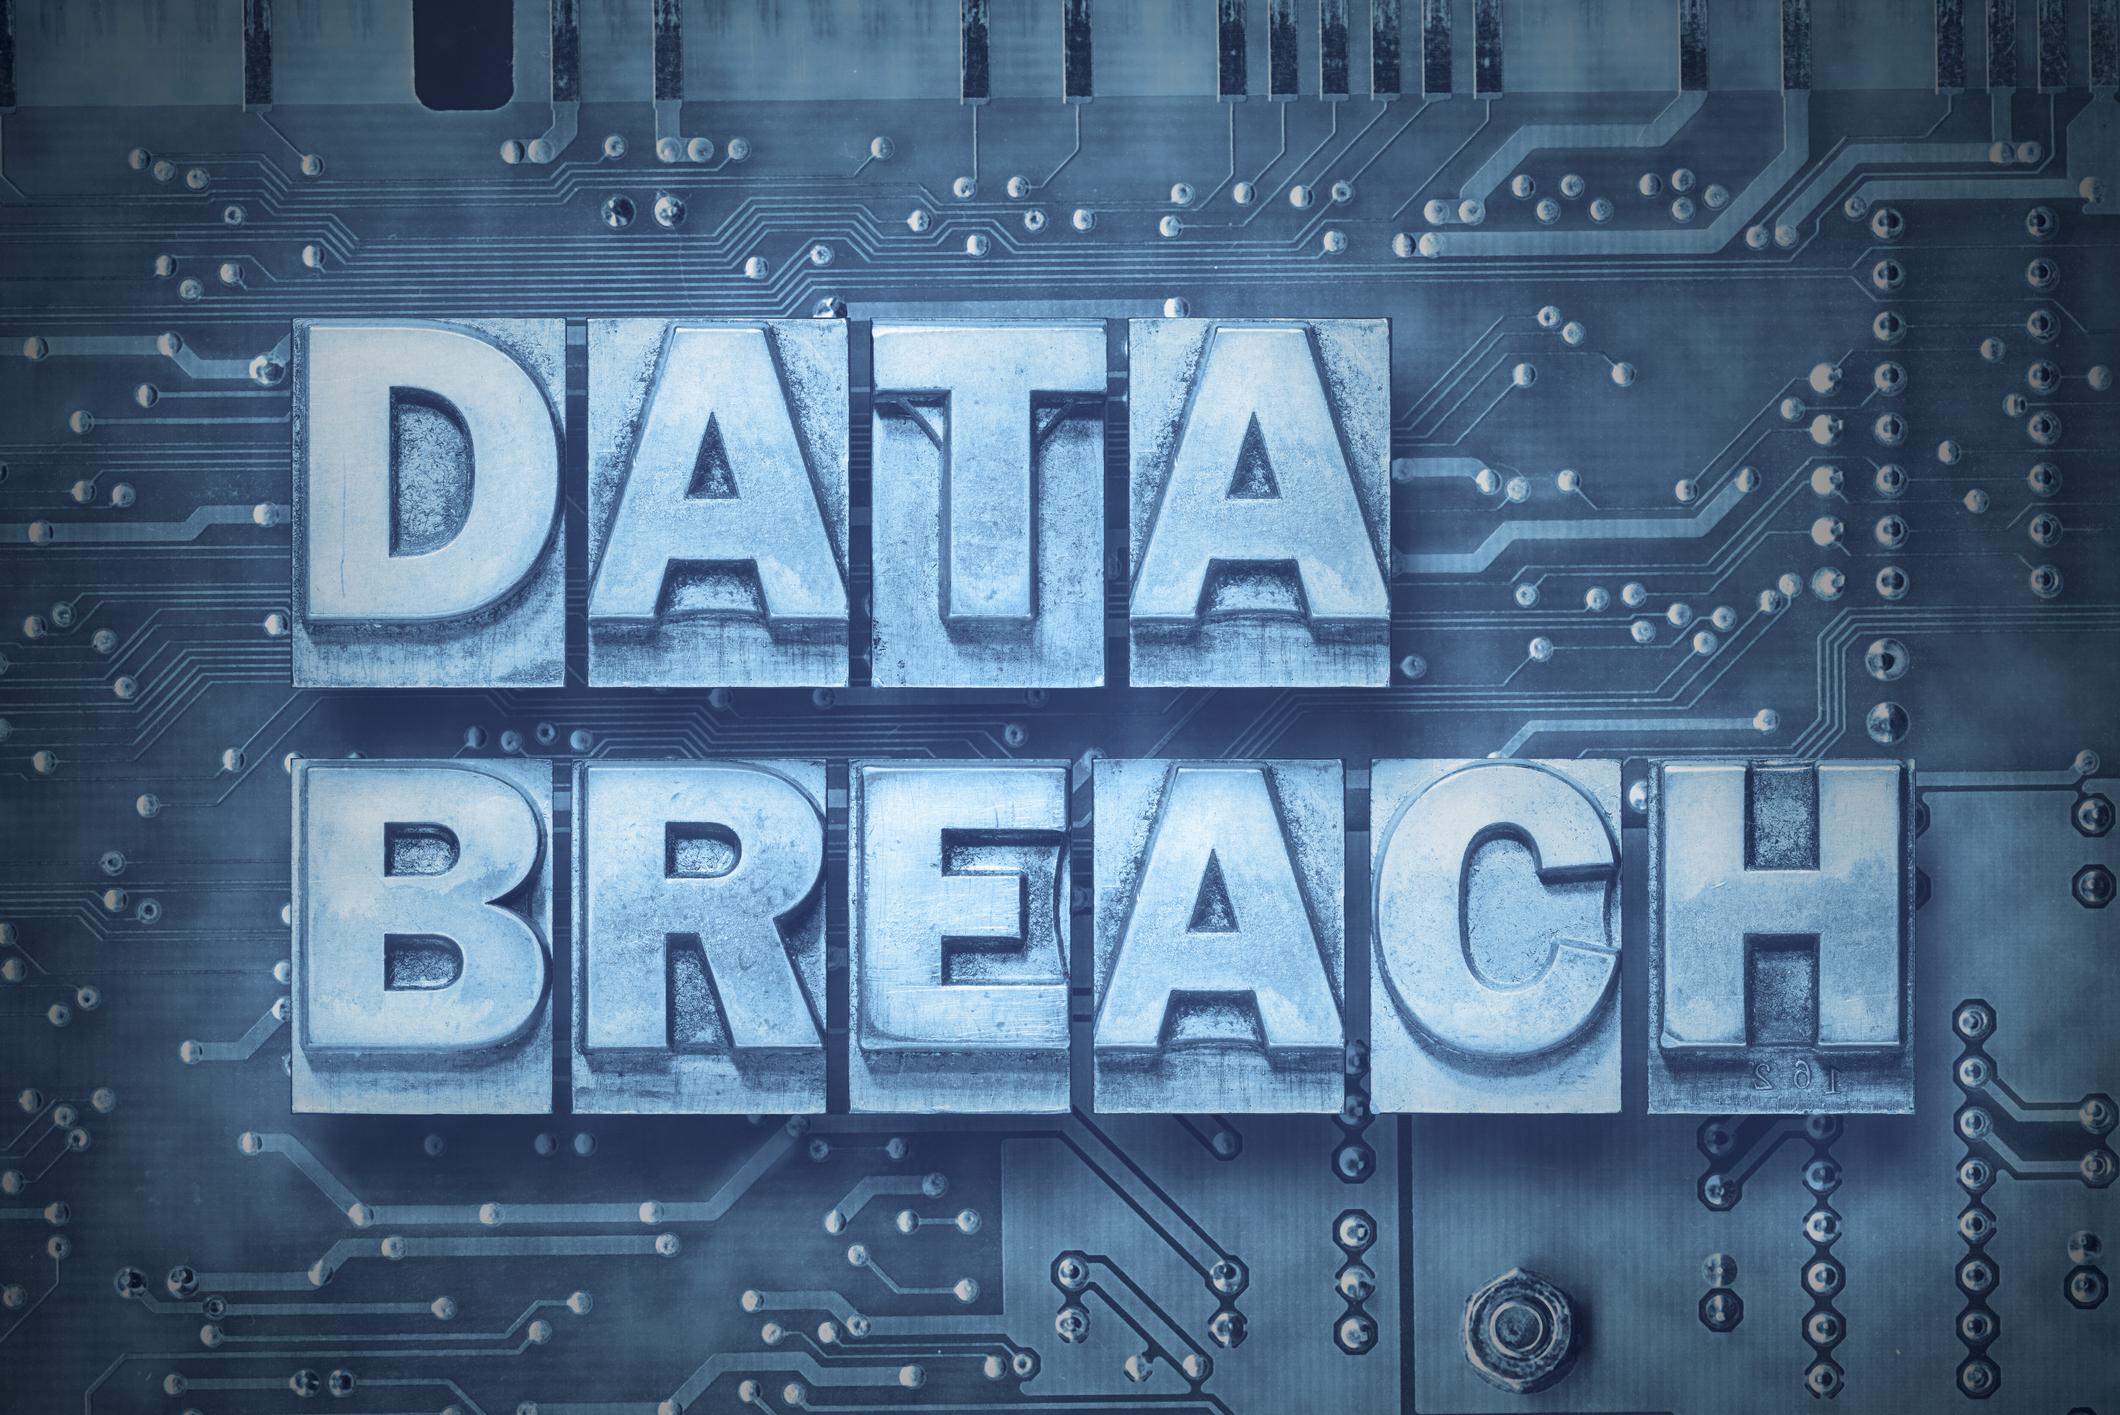 Data leak from Huazhu Hotels may affect 130 million customers ...